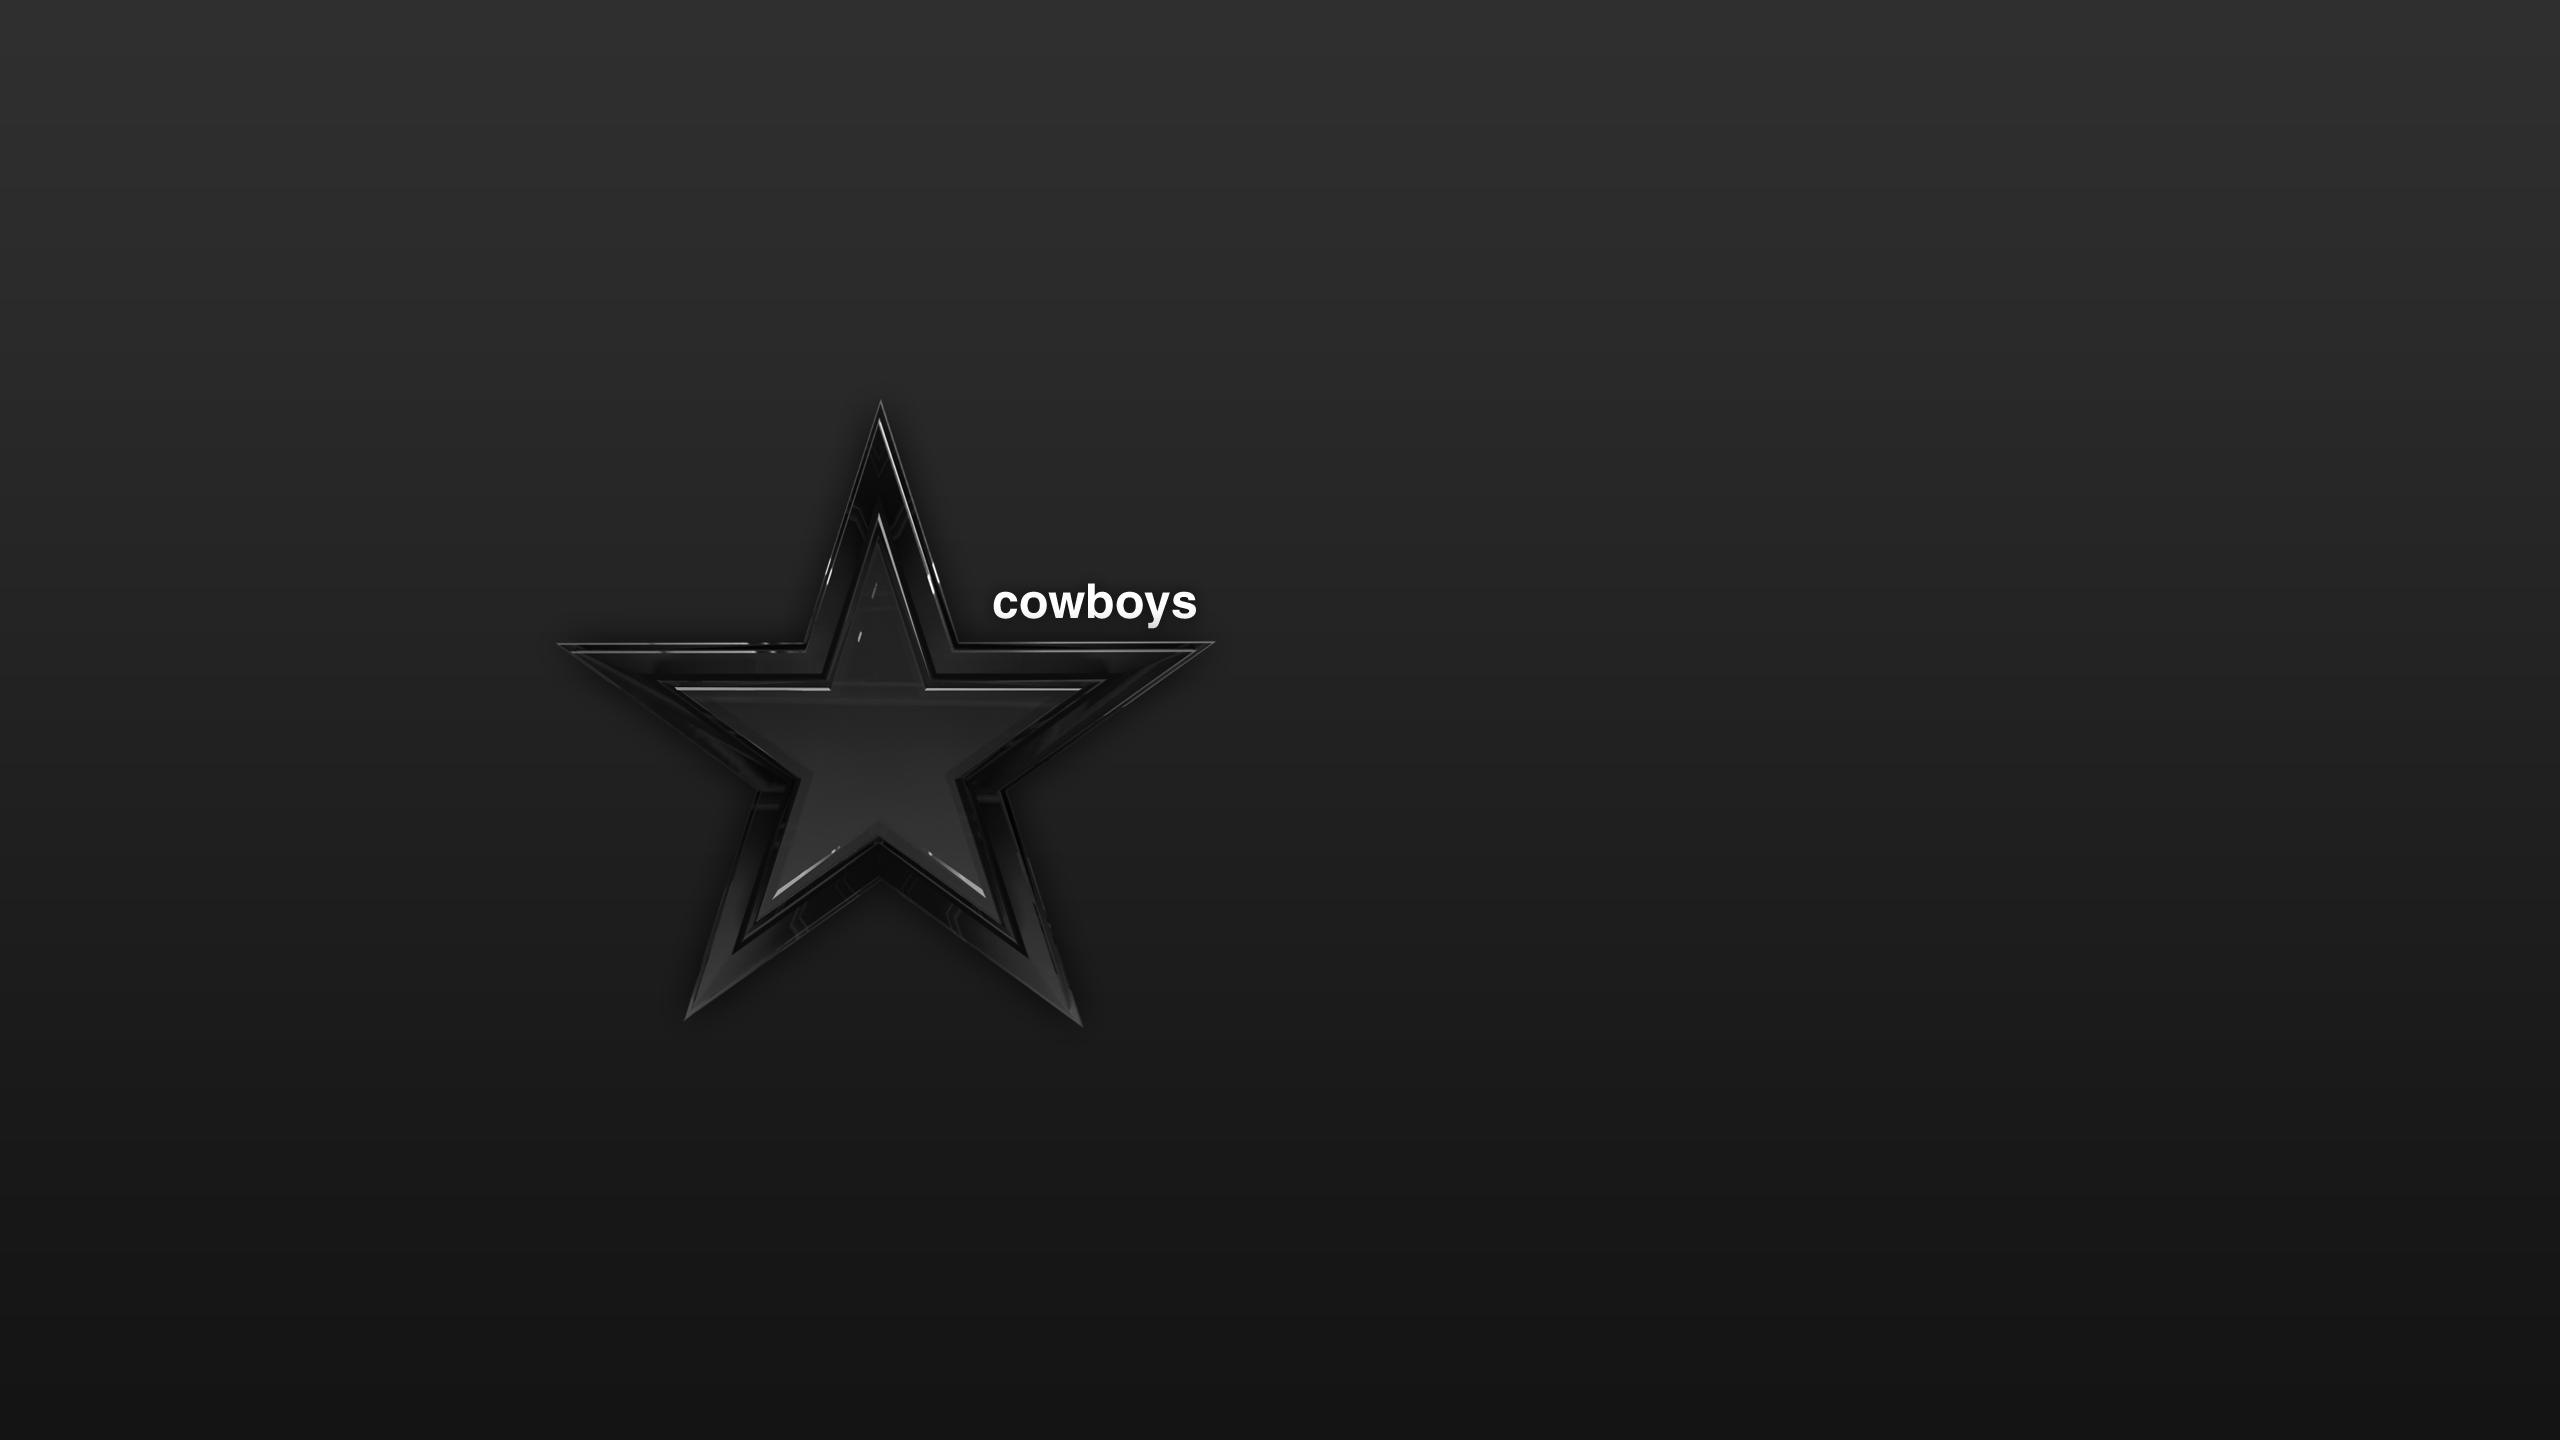 Title Dallas Cowboys Hd Desktop Wallpaper High Definition Fullscreen